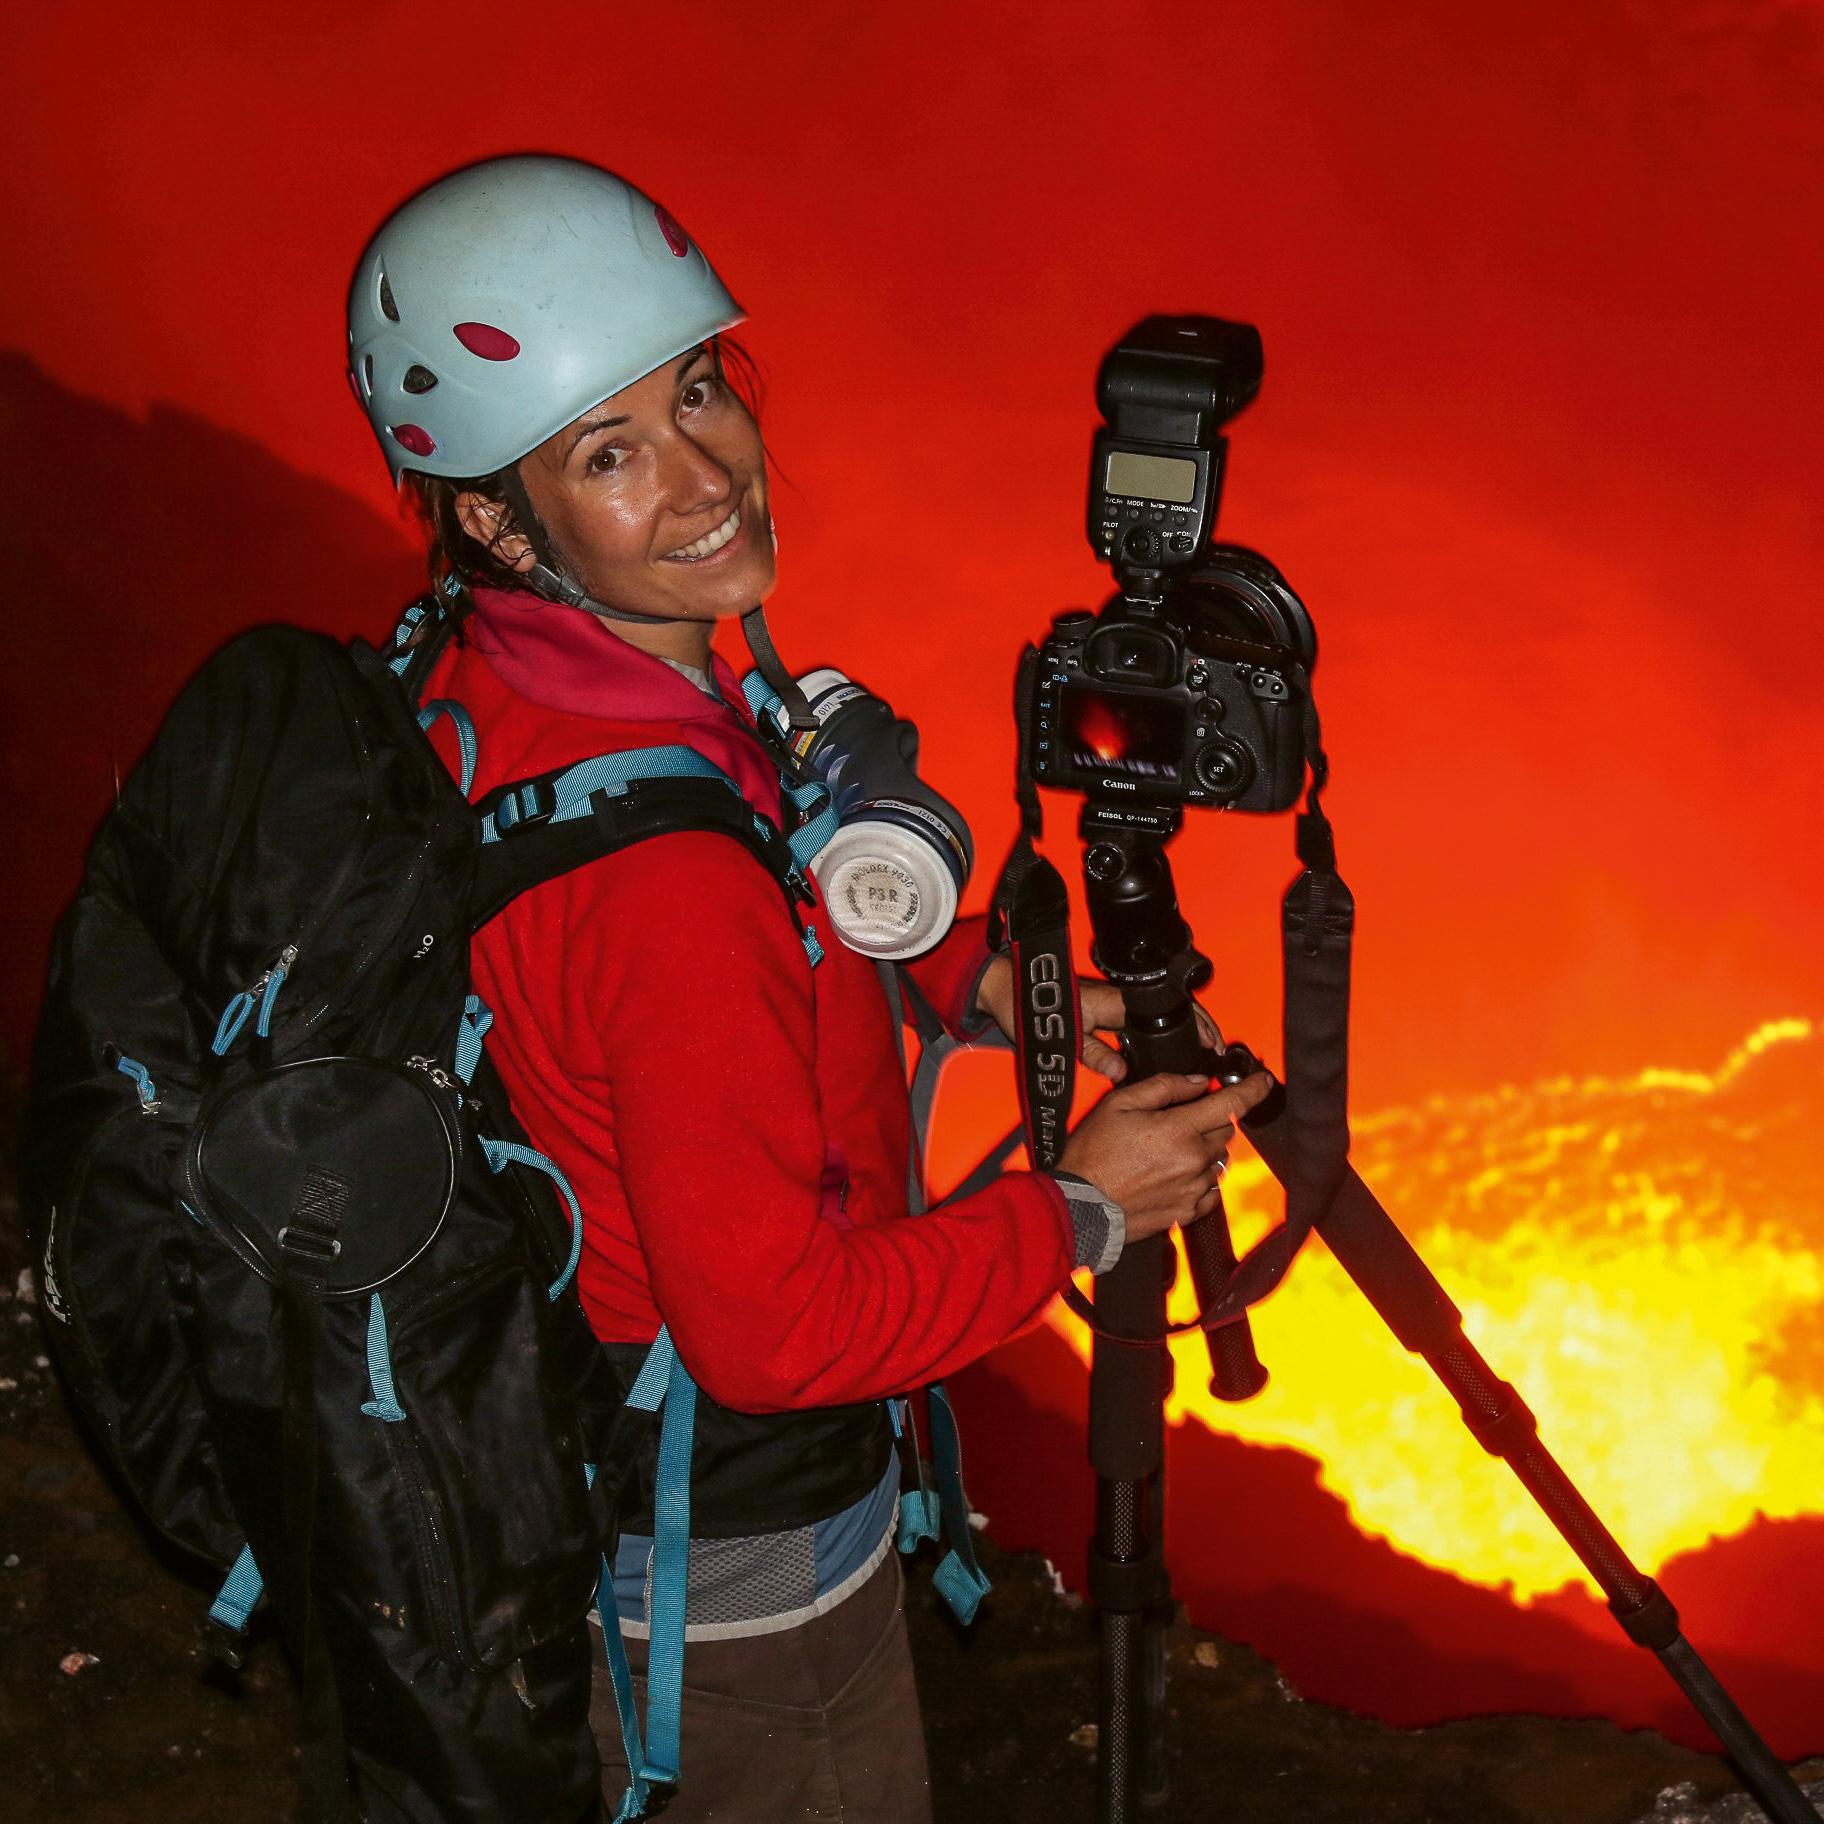 Traumberuf: Fotograf für National Geographic